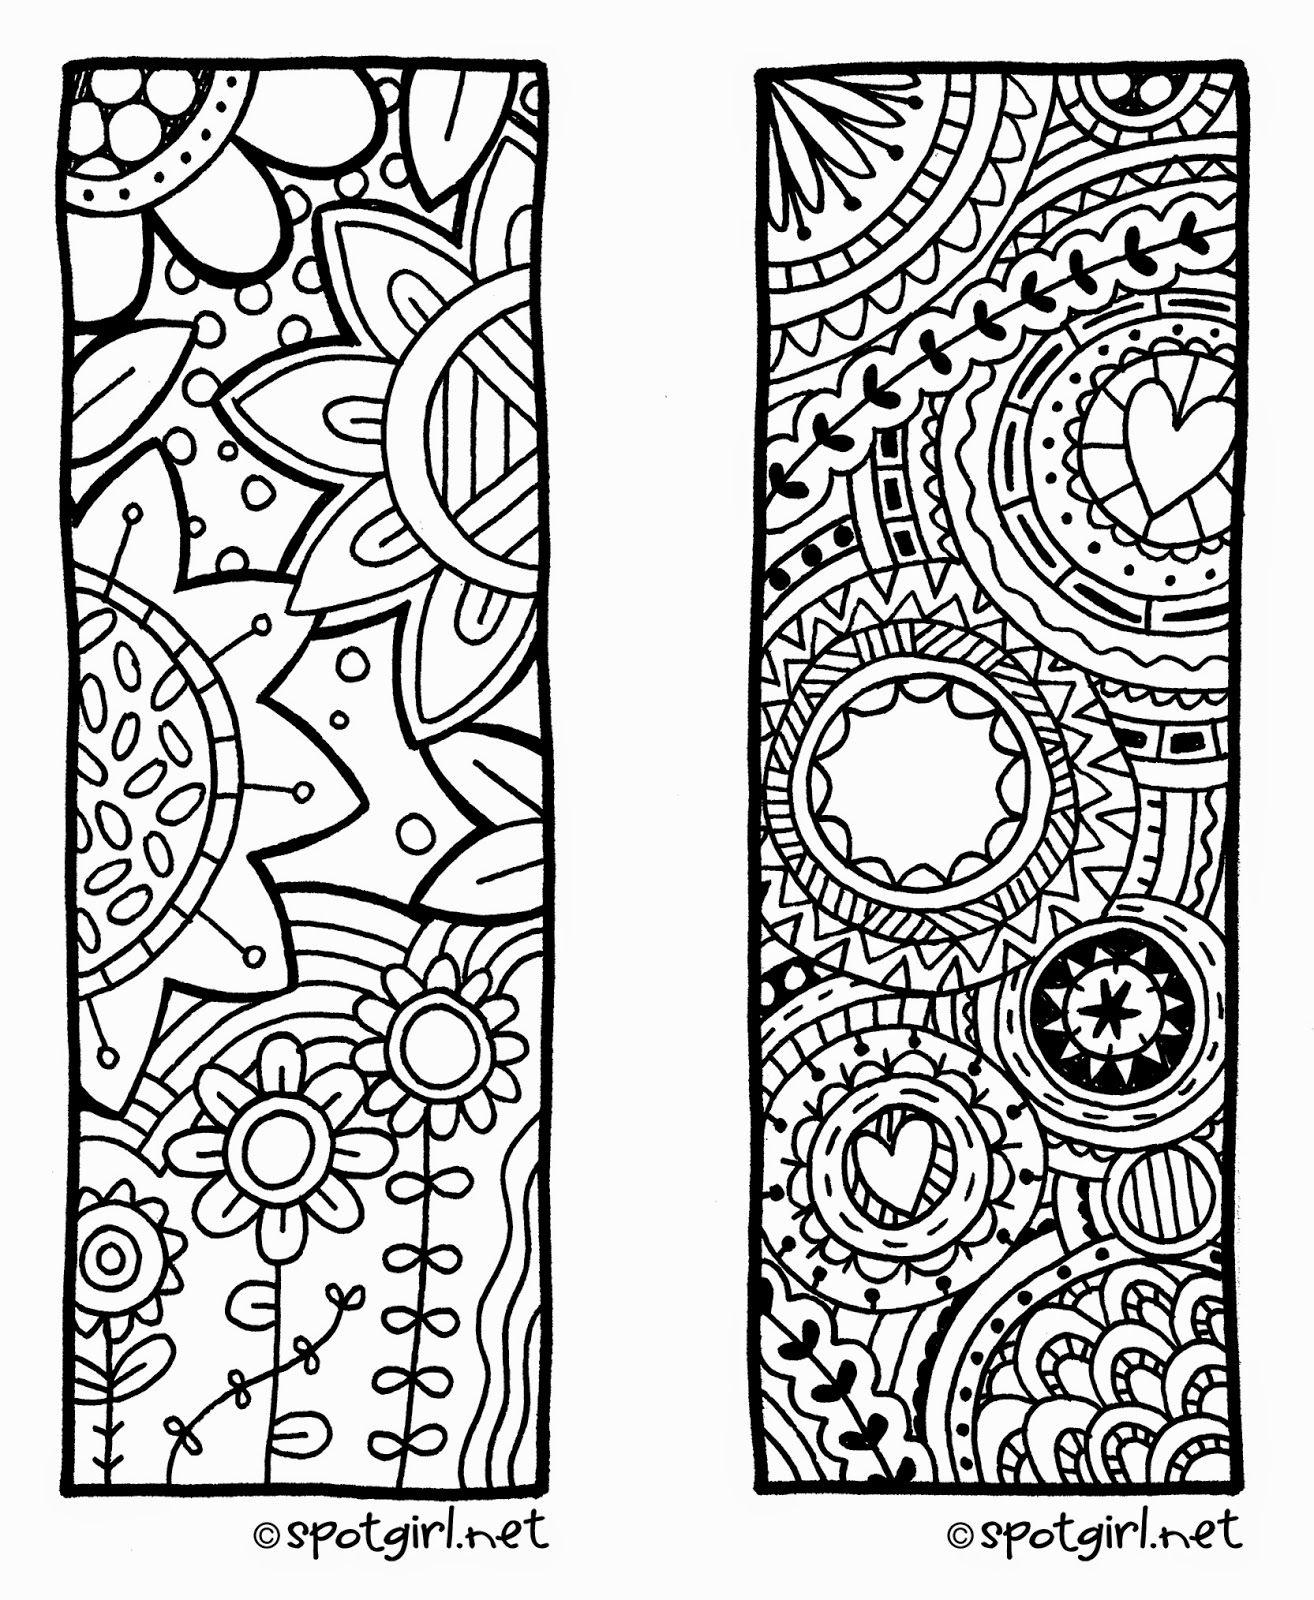 Zentangle Bookmark Printable From Spotgirl Hotcakesspot